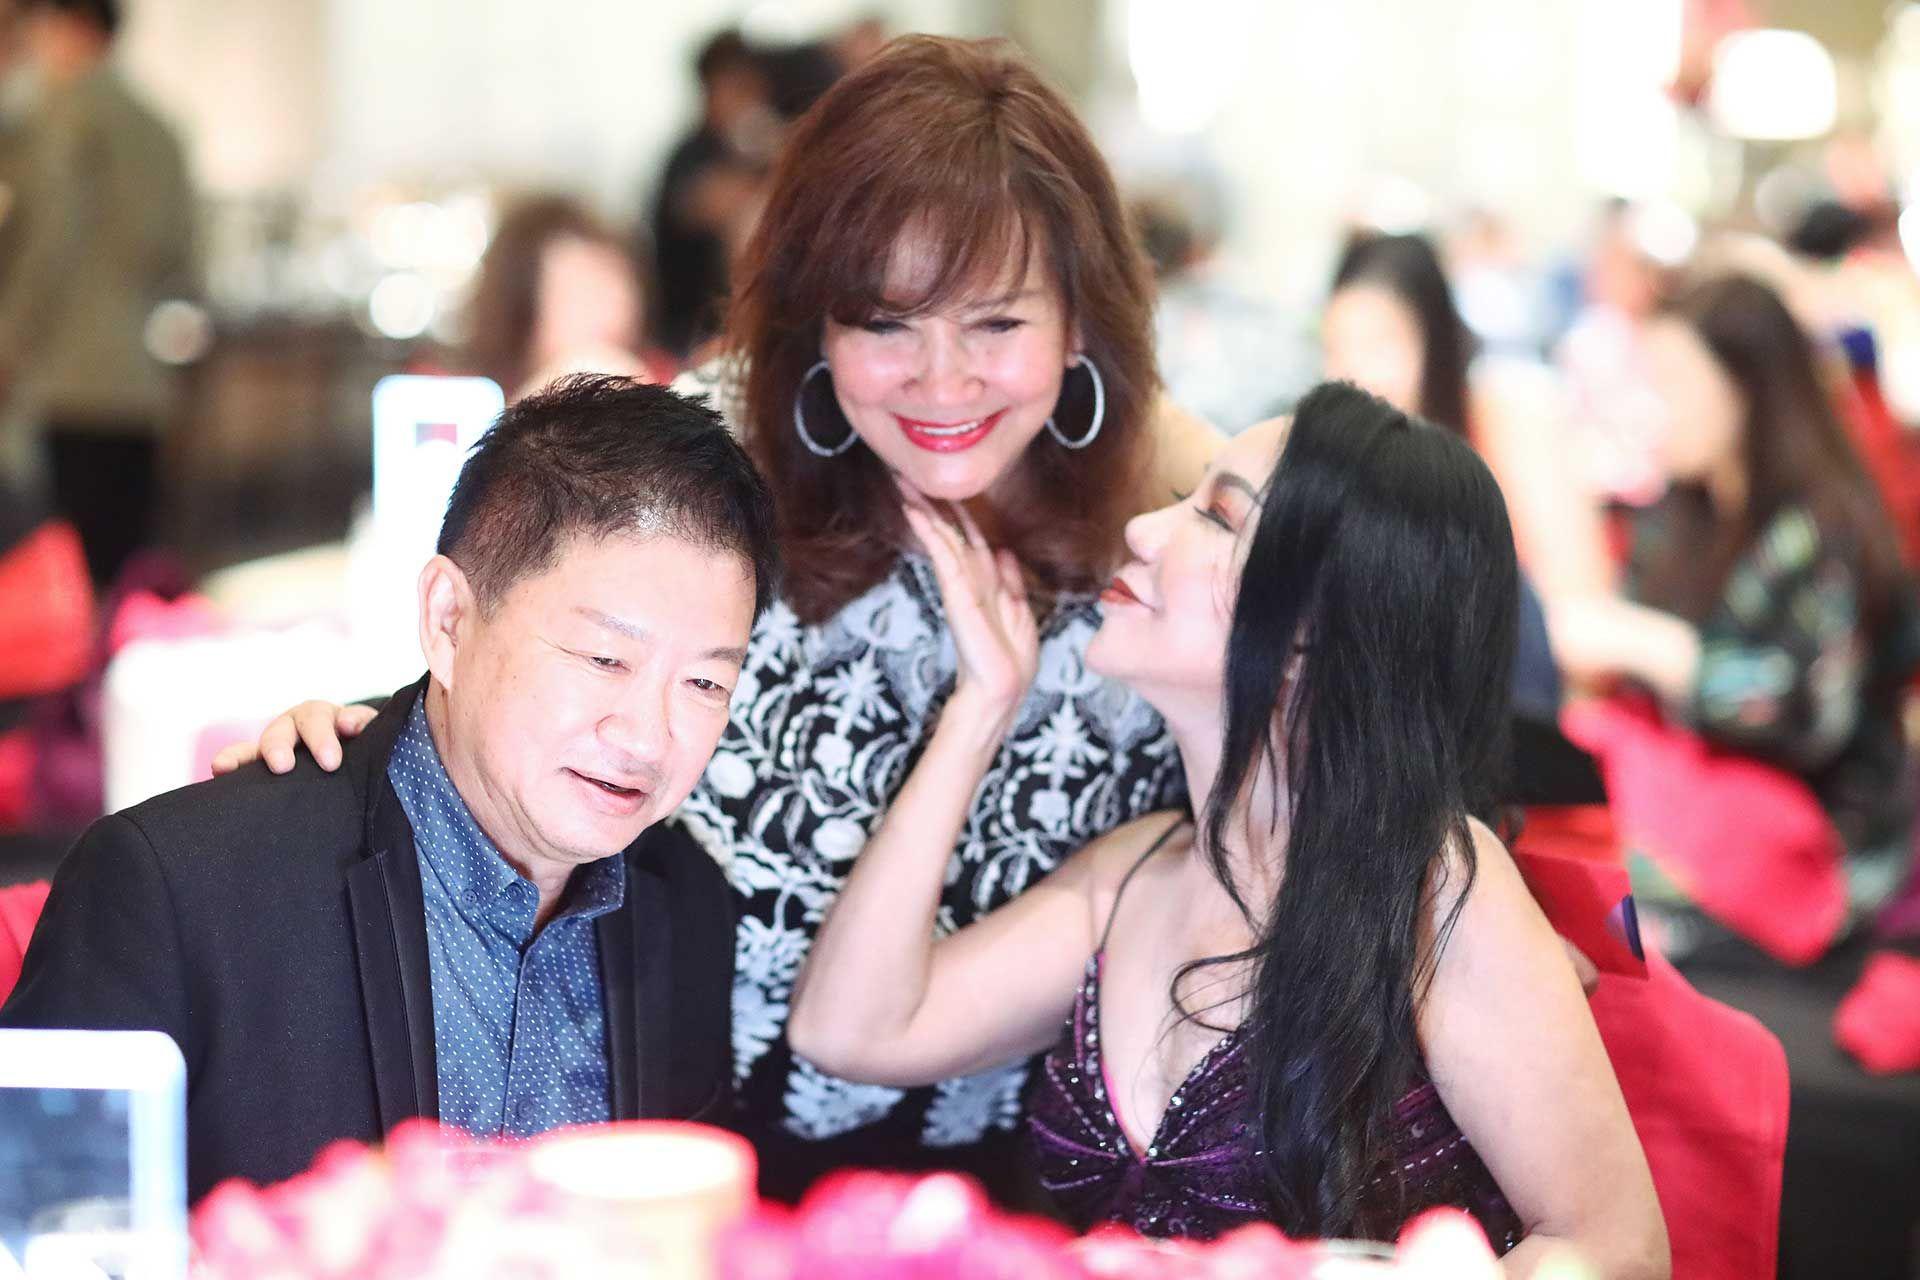 Dato' Peter Yong, Dato' Rosemarie Wee and Datin Maylene Yong